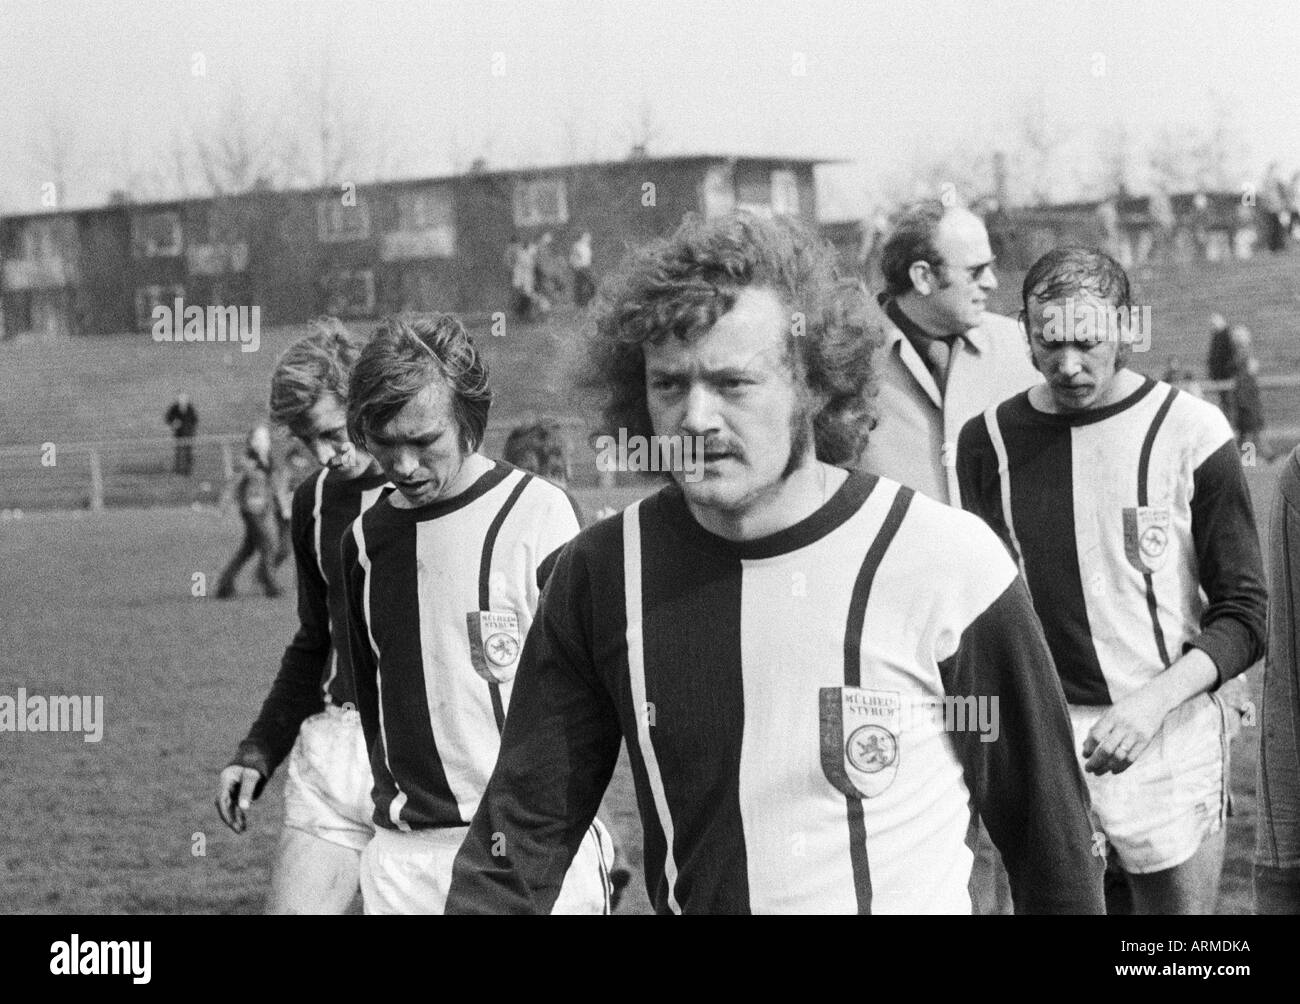 football, Regionalliga West, 1973/1974, Eintracht Gelsenkirchen versus 1. FC Muelheim 4:2, Sued Stadium Gelsenkirchen, football players leave the pitch, f.l.t.r. Hartmut Limpert (Muelheim), Herbert Bals (Muelheim), Wilfried Schlimm (Muelheim), Heiko Merte - Stock Image